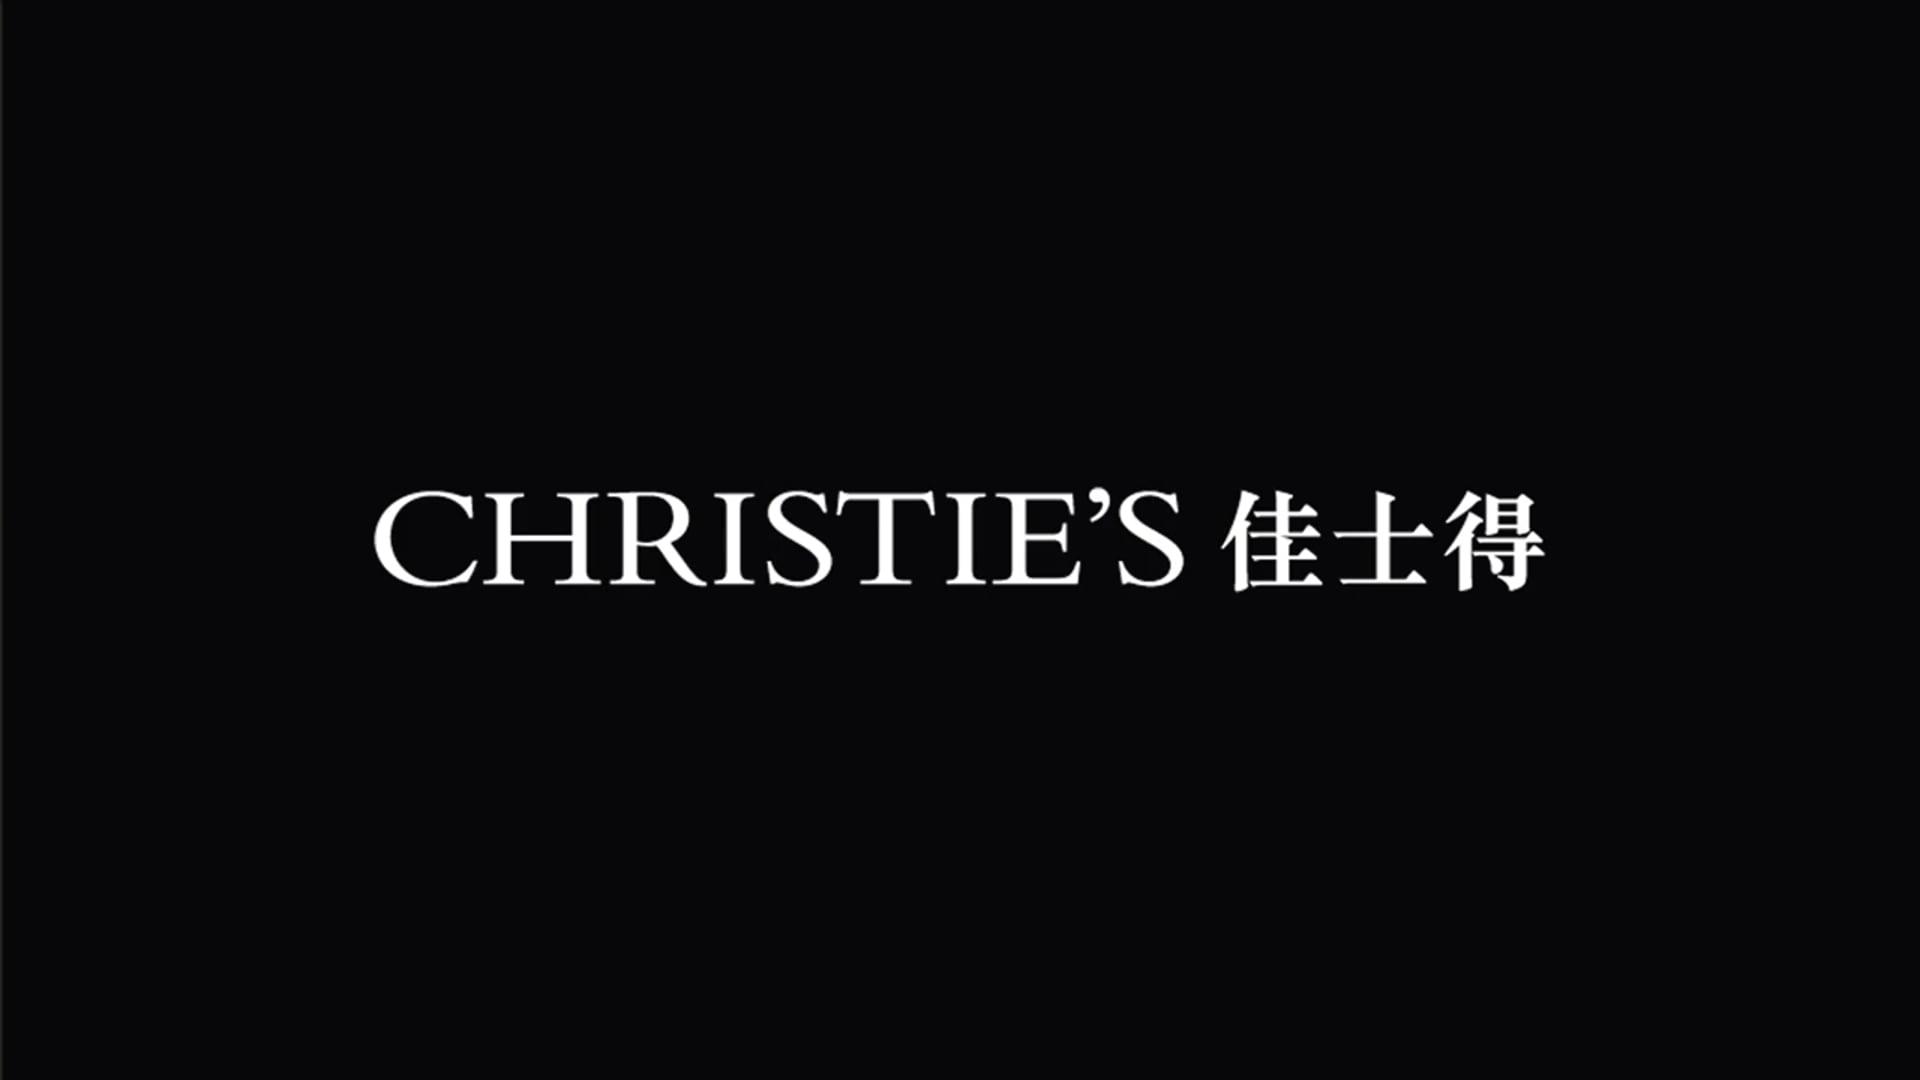 Christie's Artist Studio Visit